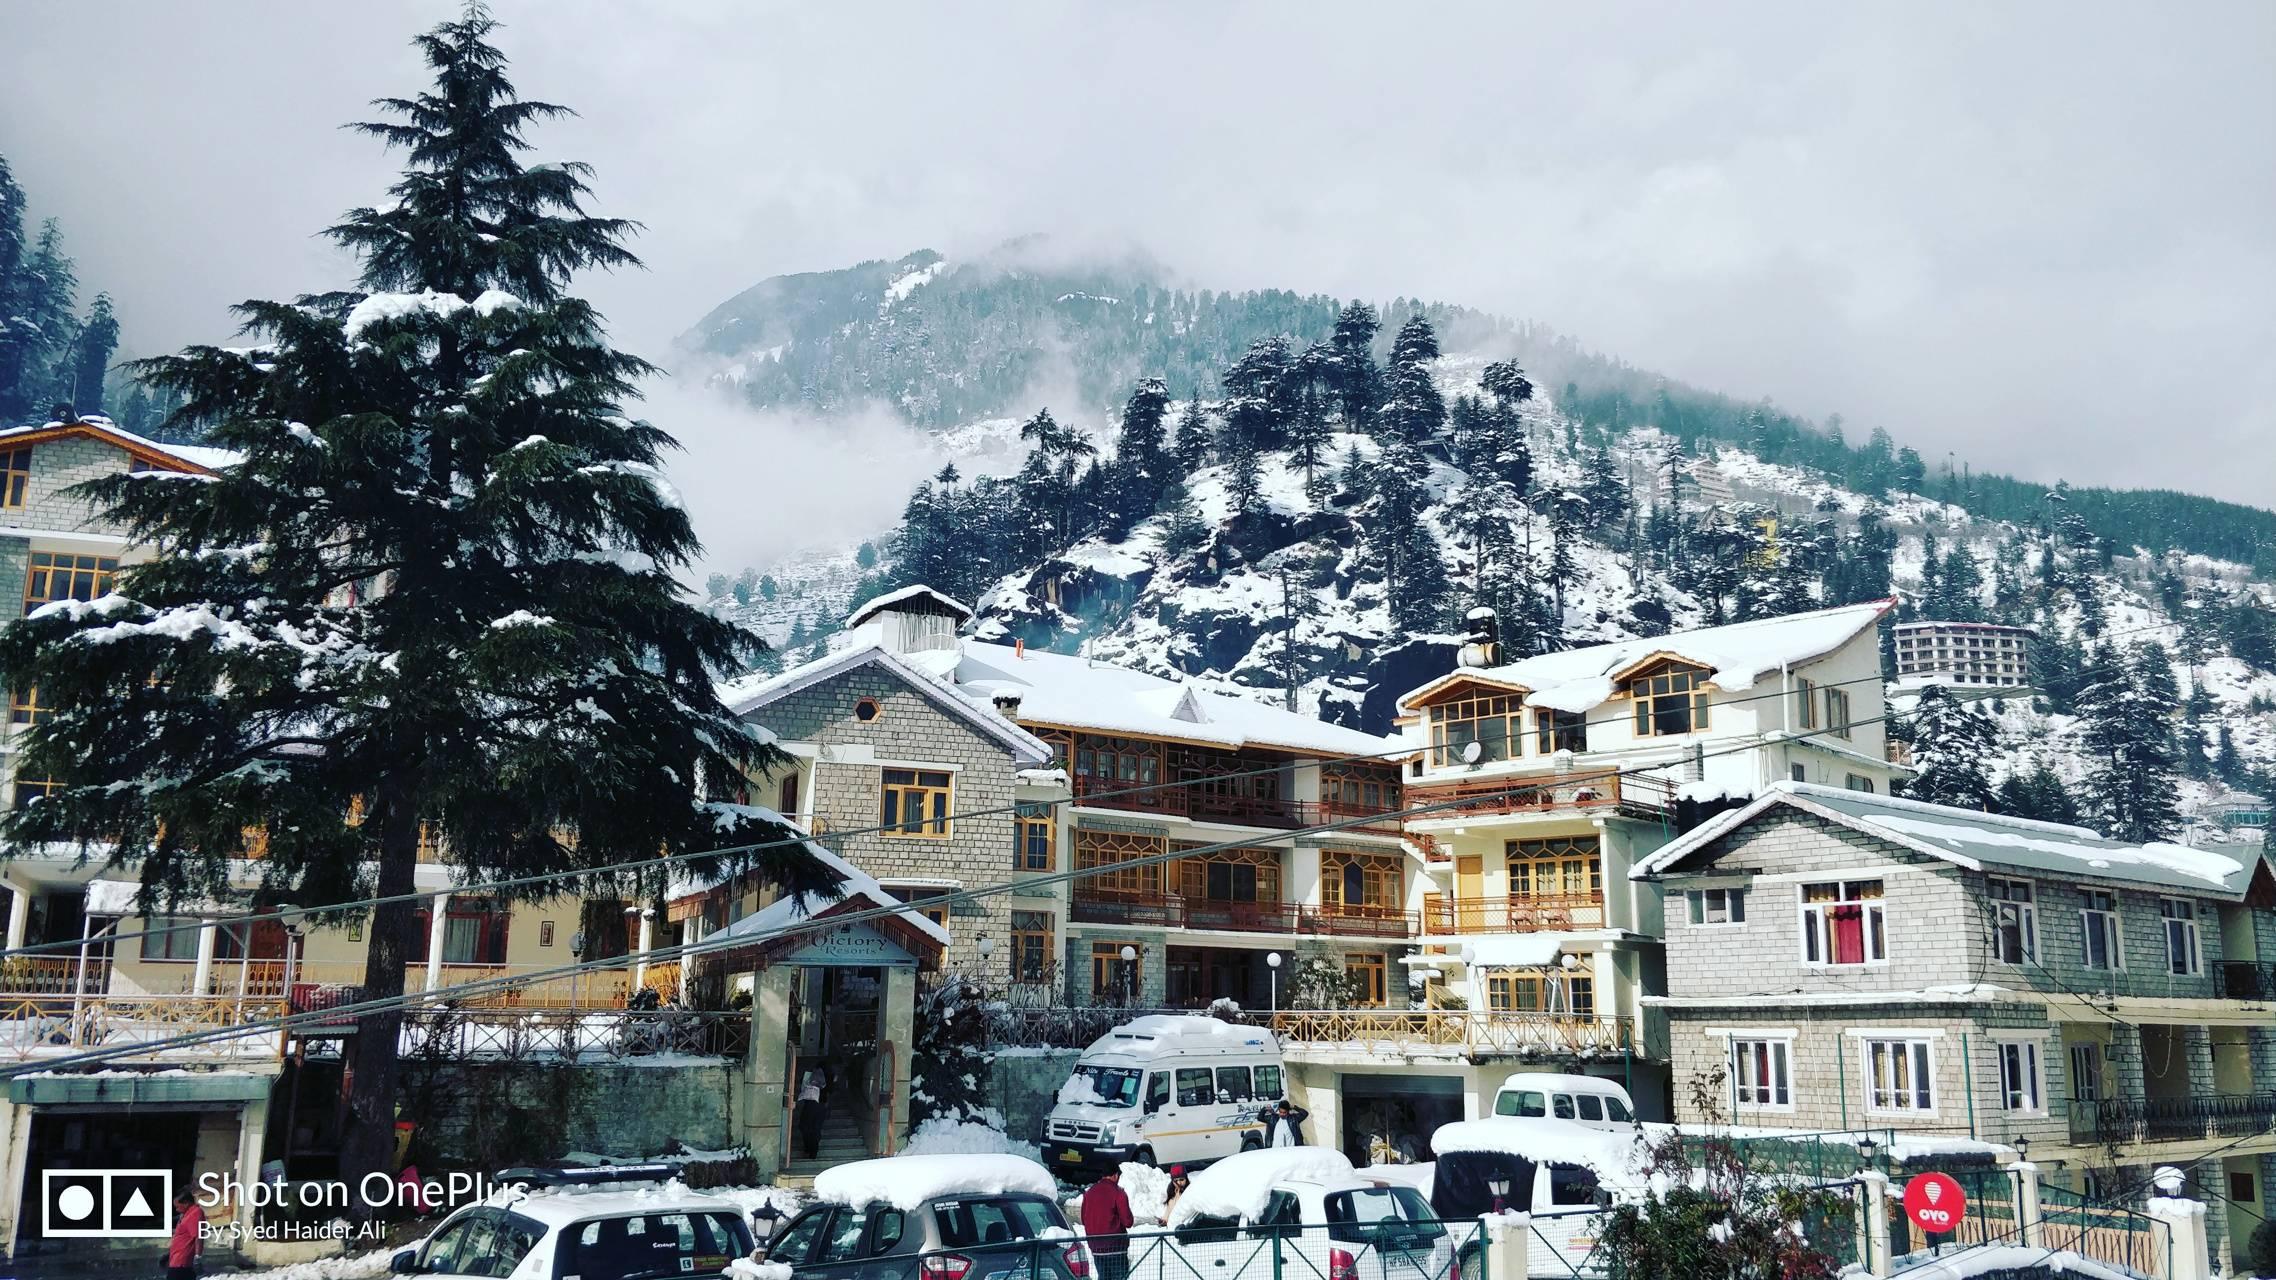 SnowManali